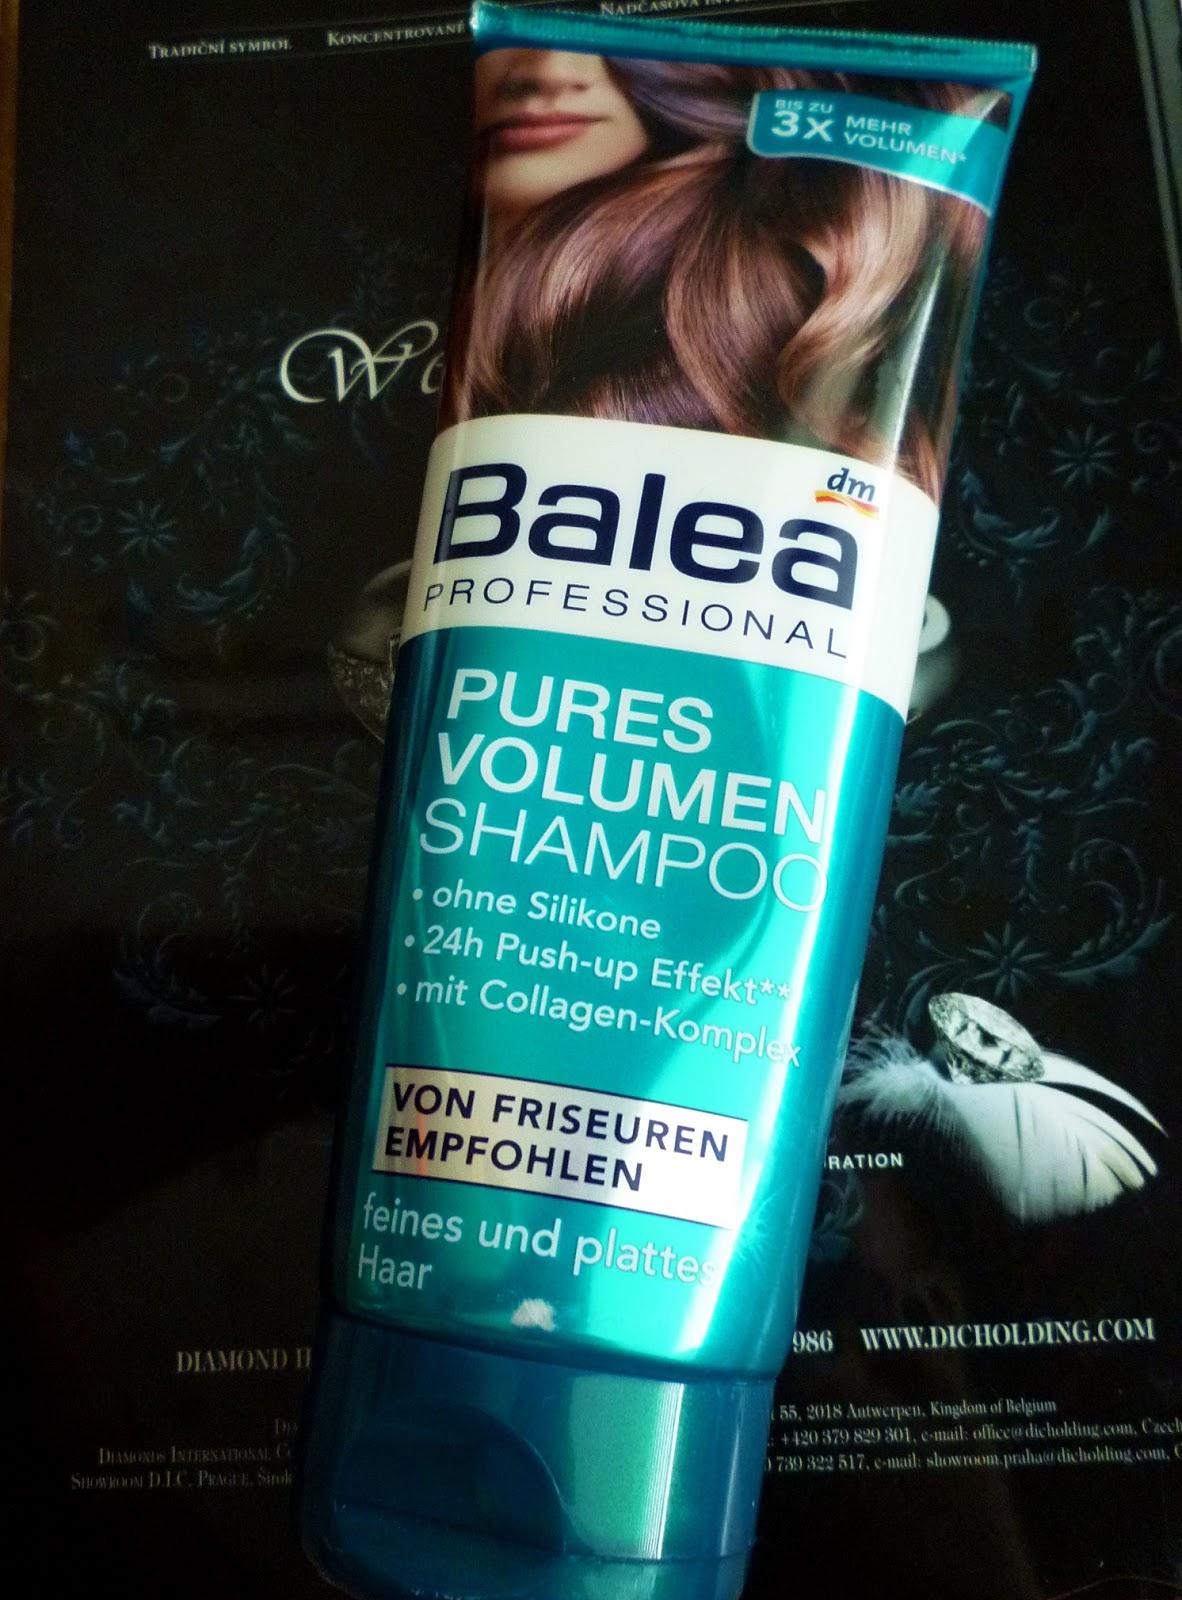 vanilkov latt recenze balea pures volumen shampoo sp lung. Black Bedroom Furniture Sets. Home Design Ideas